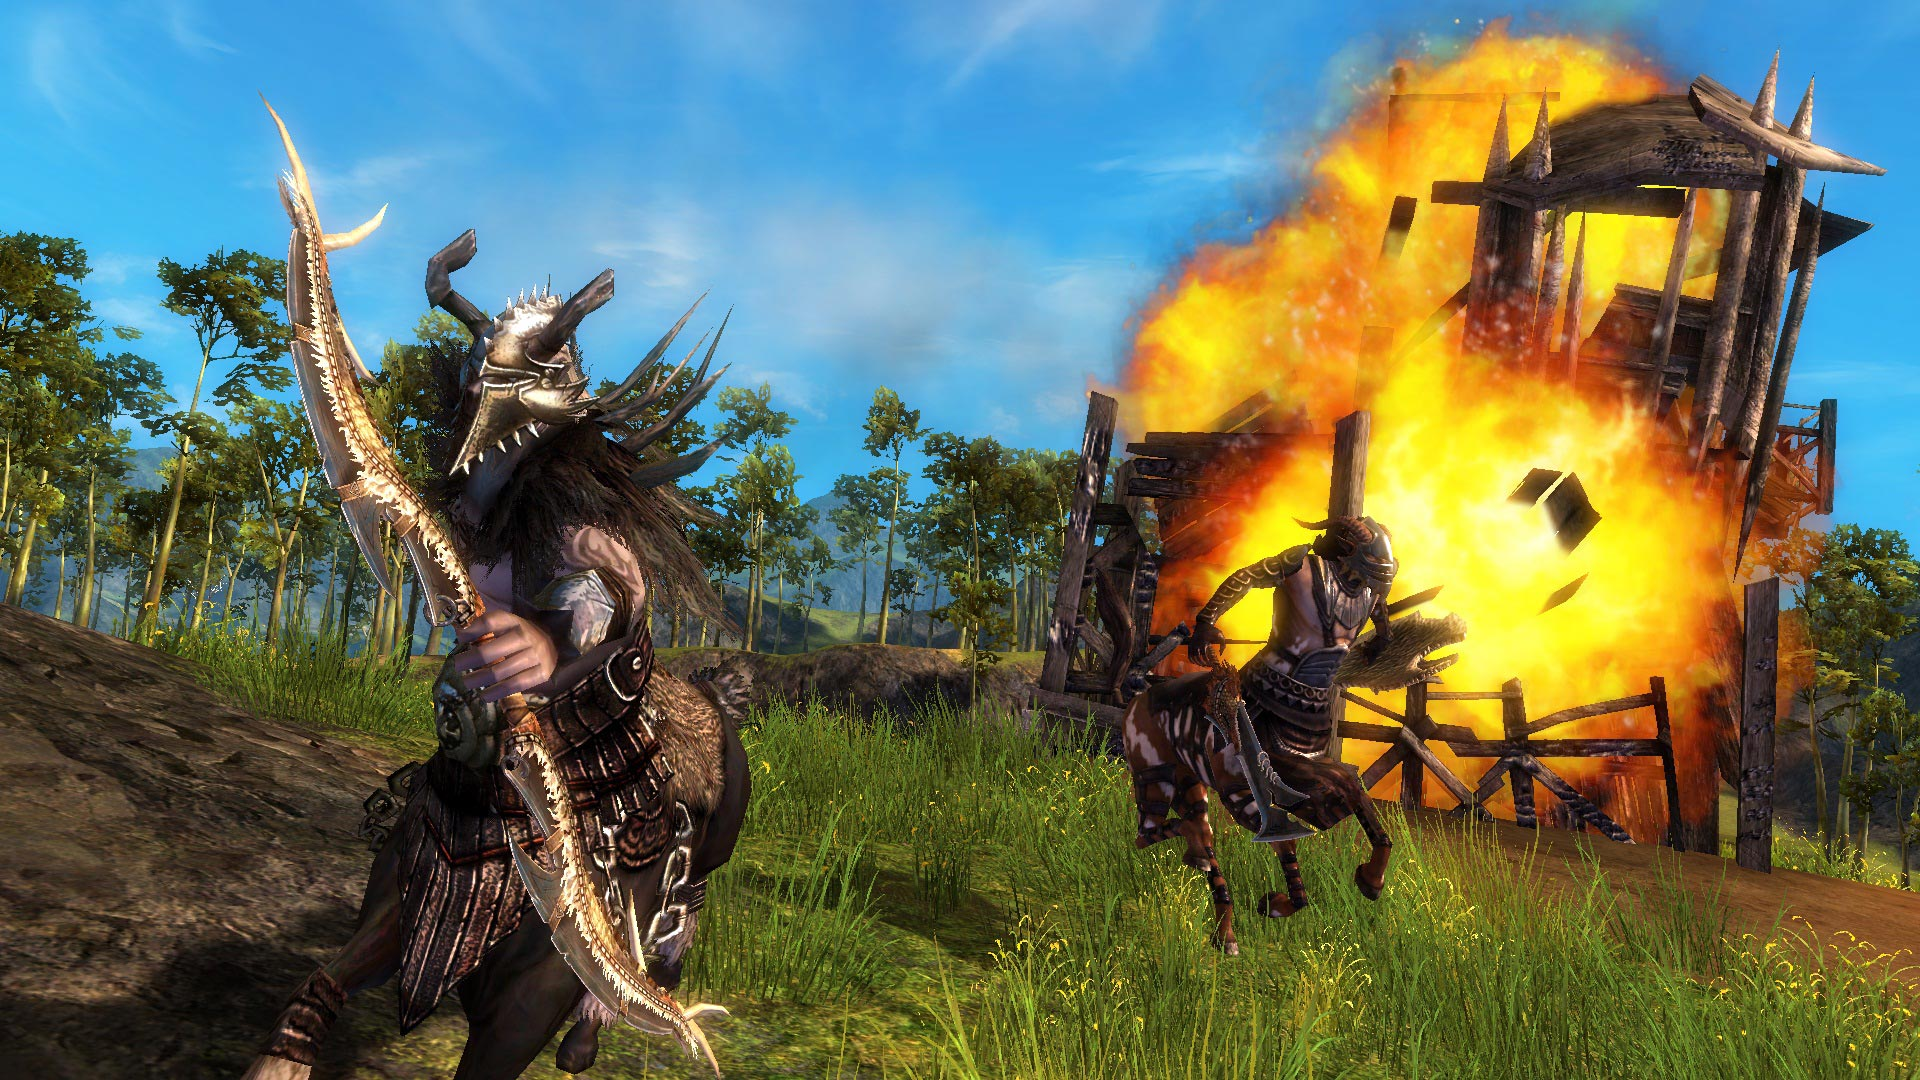 Guild Wars 2 Key (Digital Deluxe Edition) Screenshot 12.